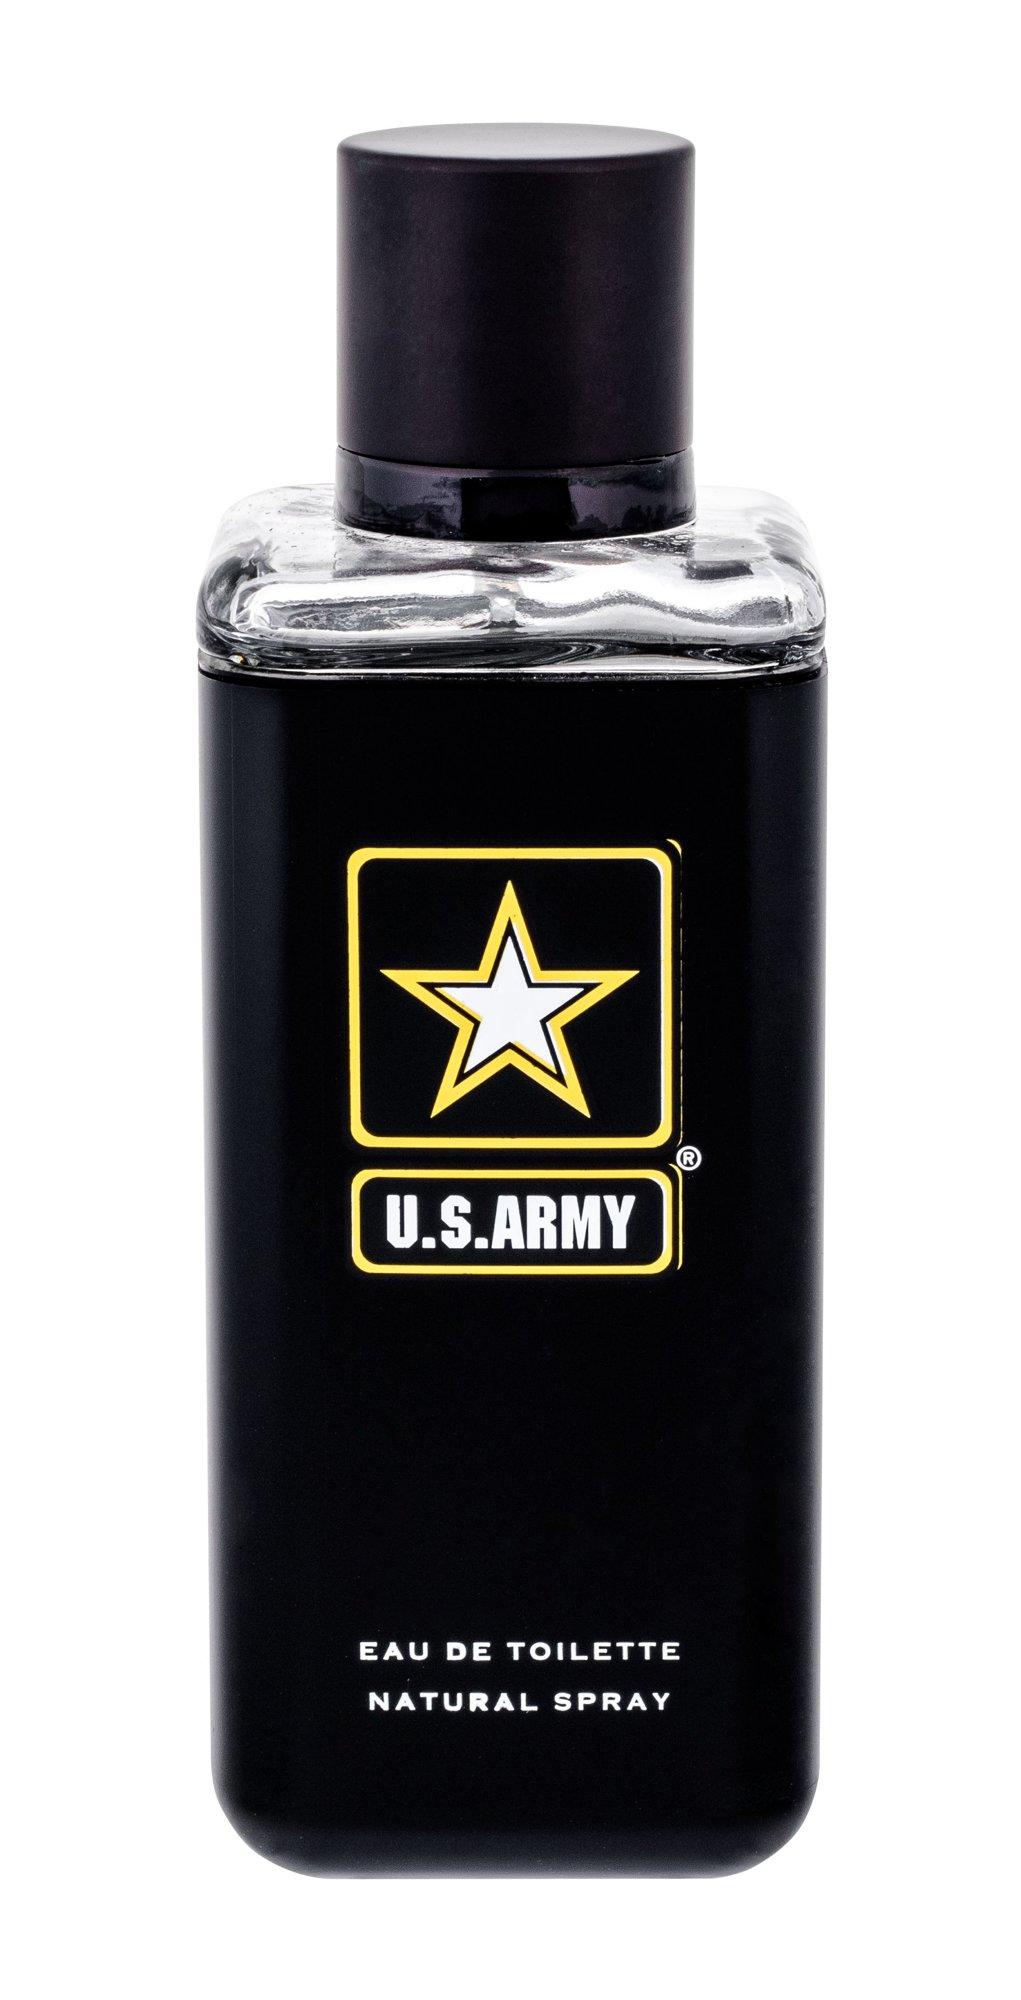 U.S.Army Black